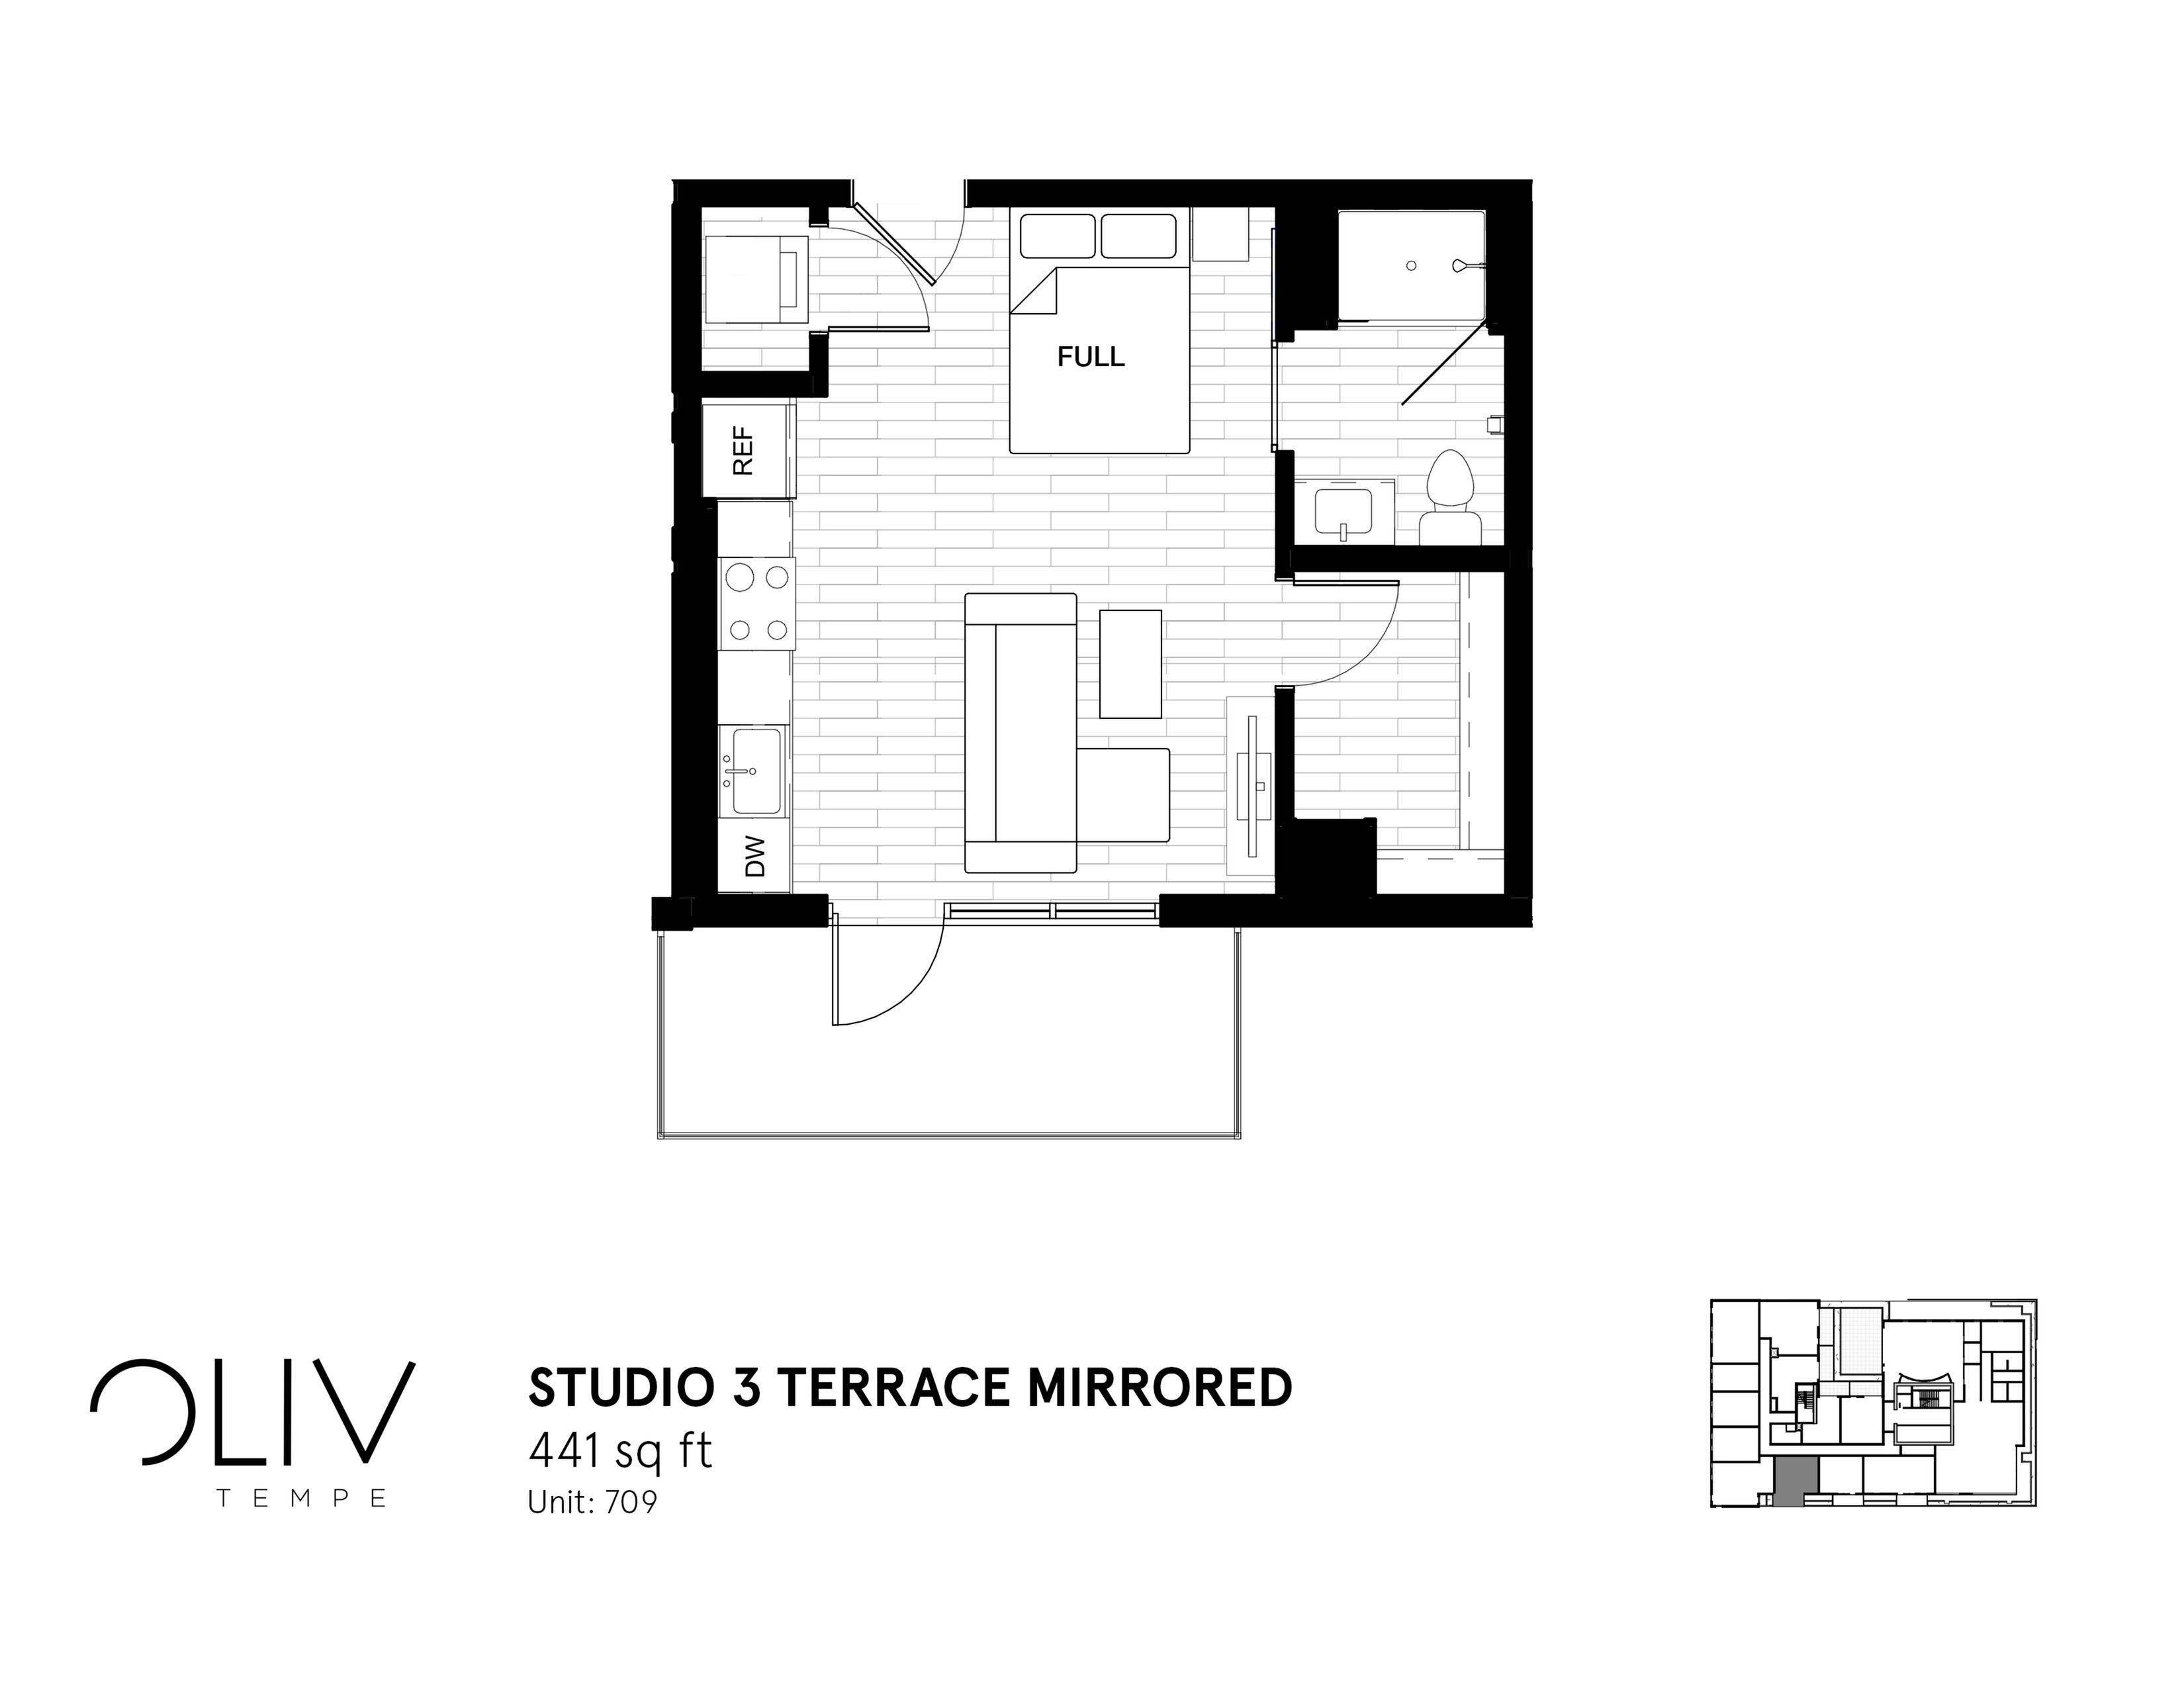 Studio 3 Terrace Mirrored